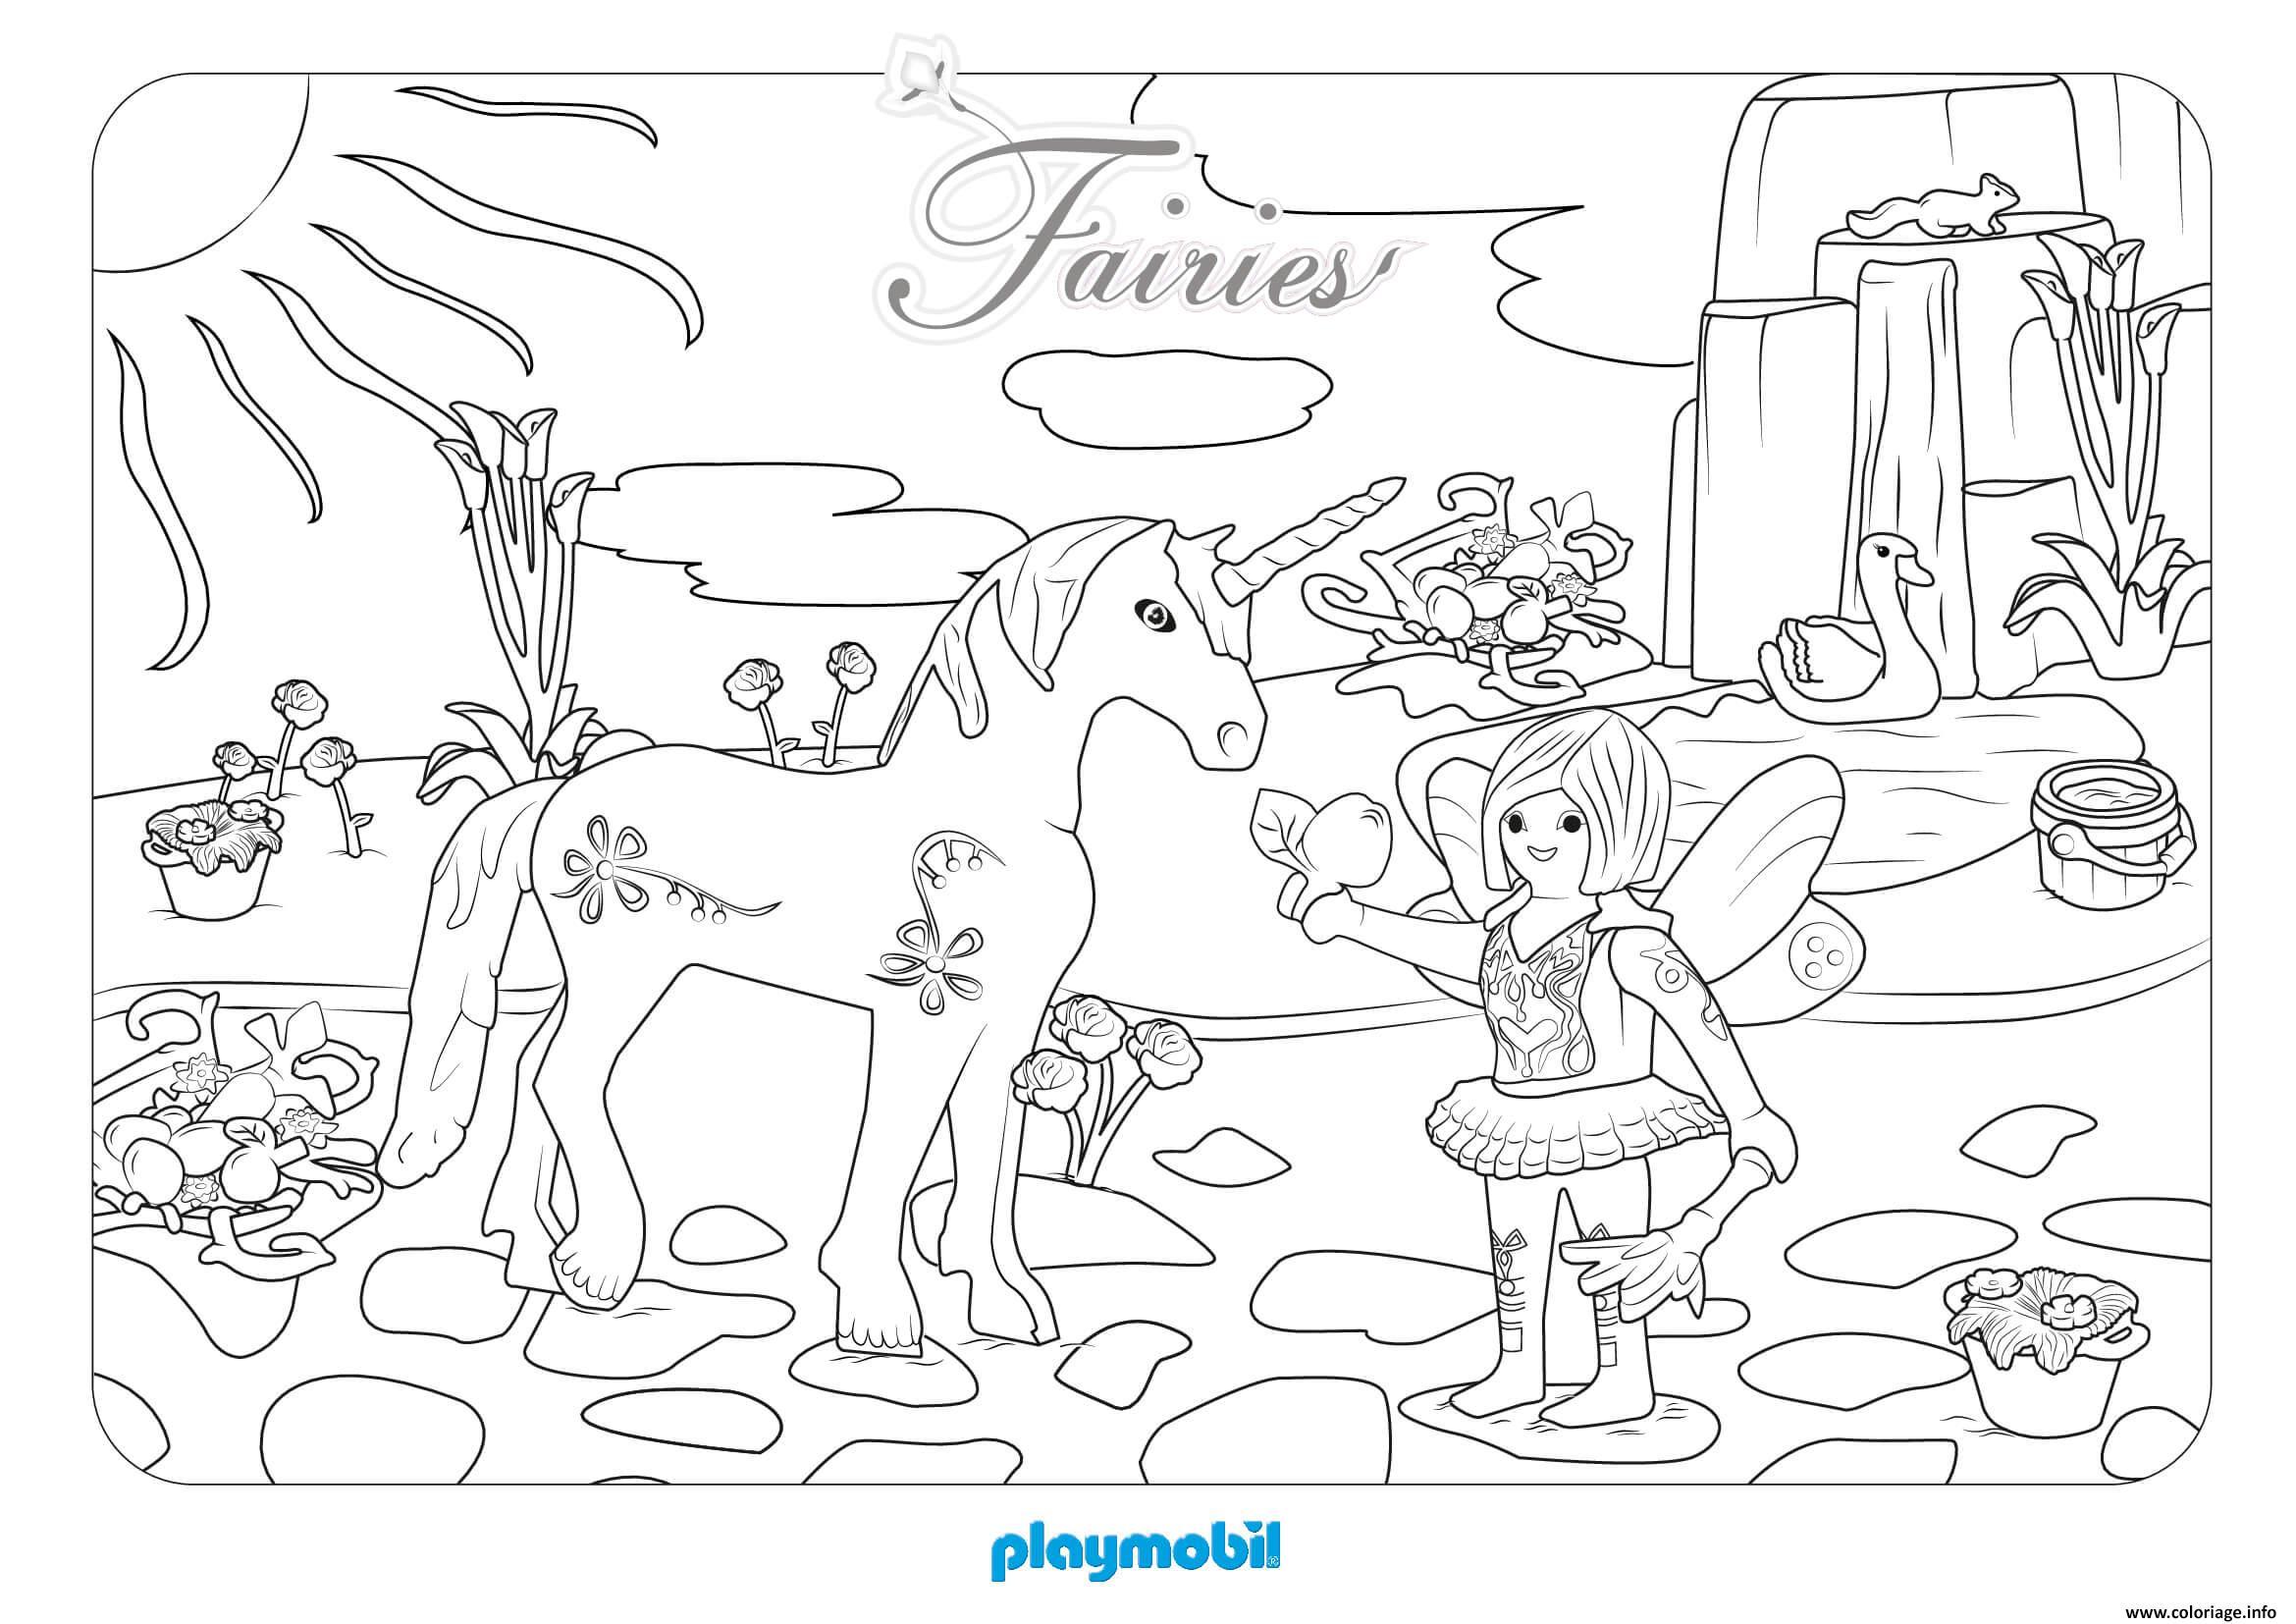 Coloriage playmobil fee et licorne - JeColorie.com